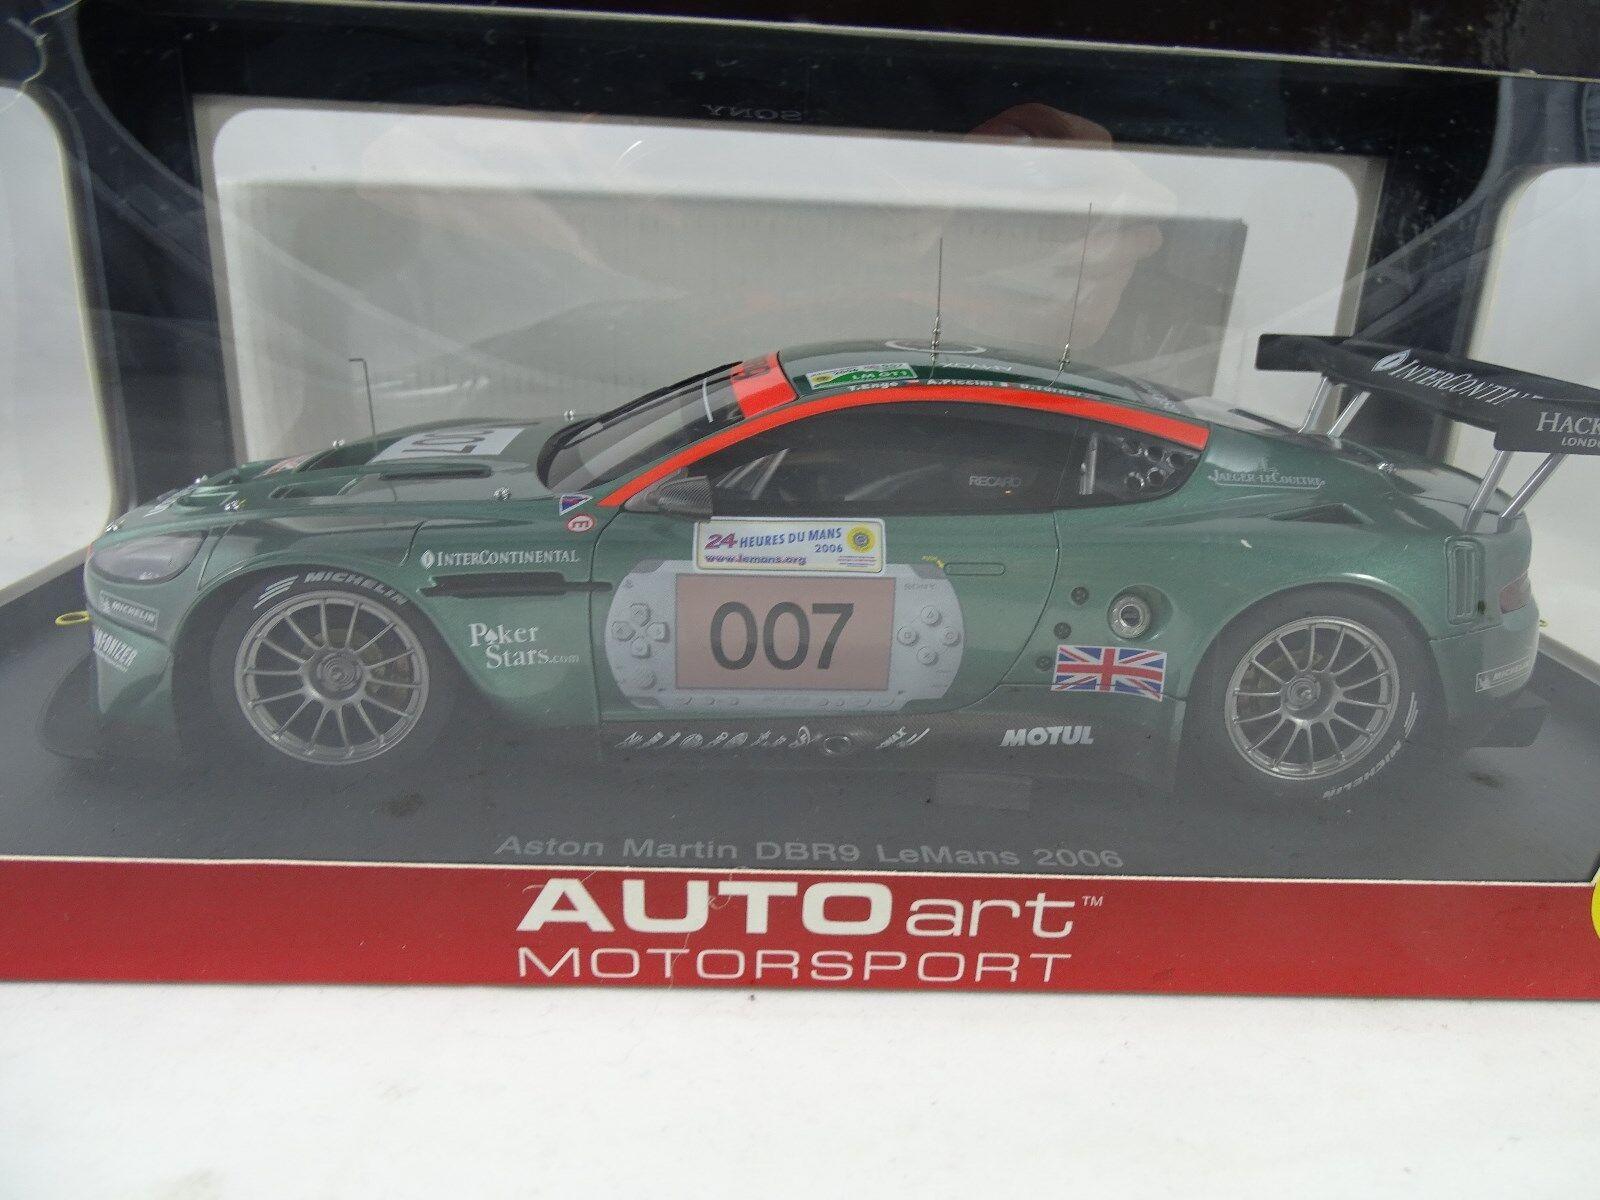 1 18 Autoart Aston Martin Dbr9 2006 Rarity §